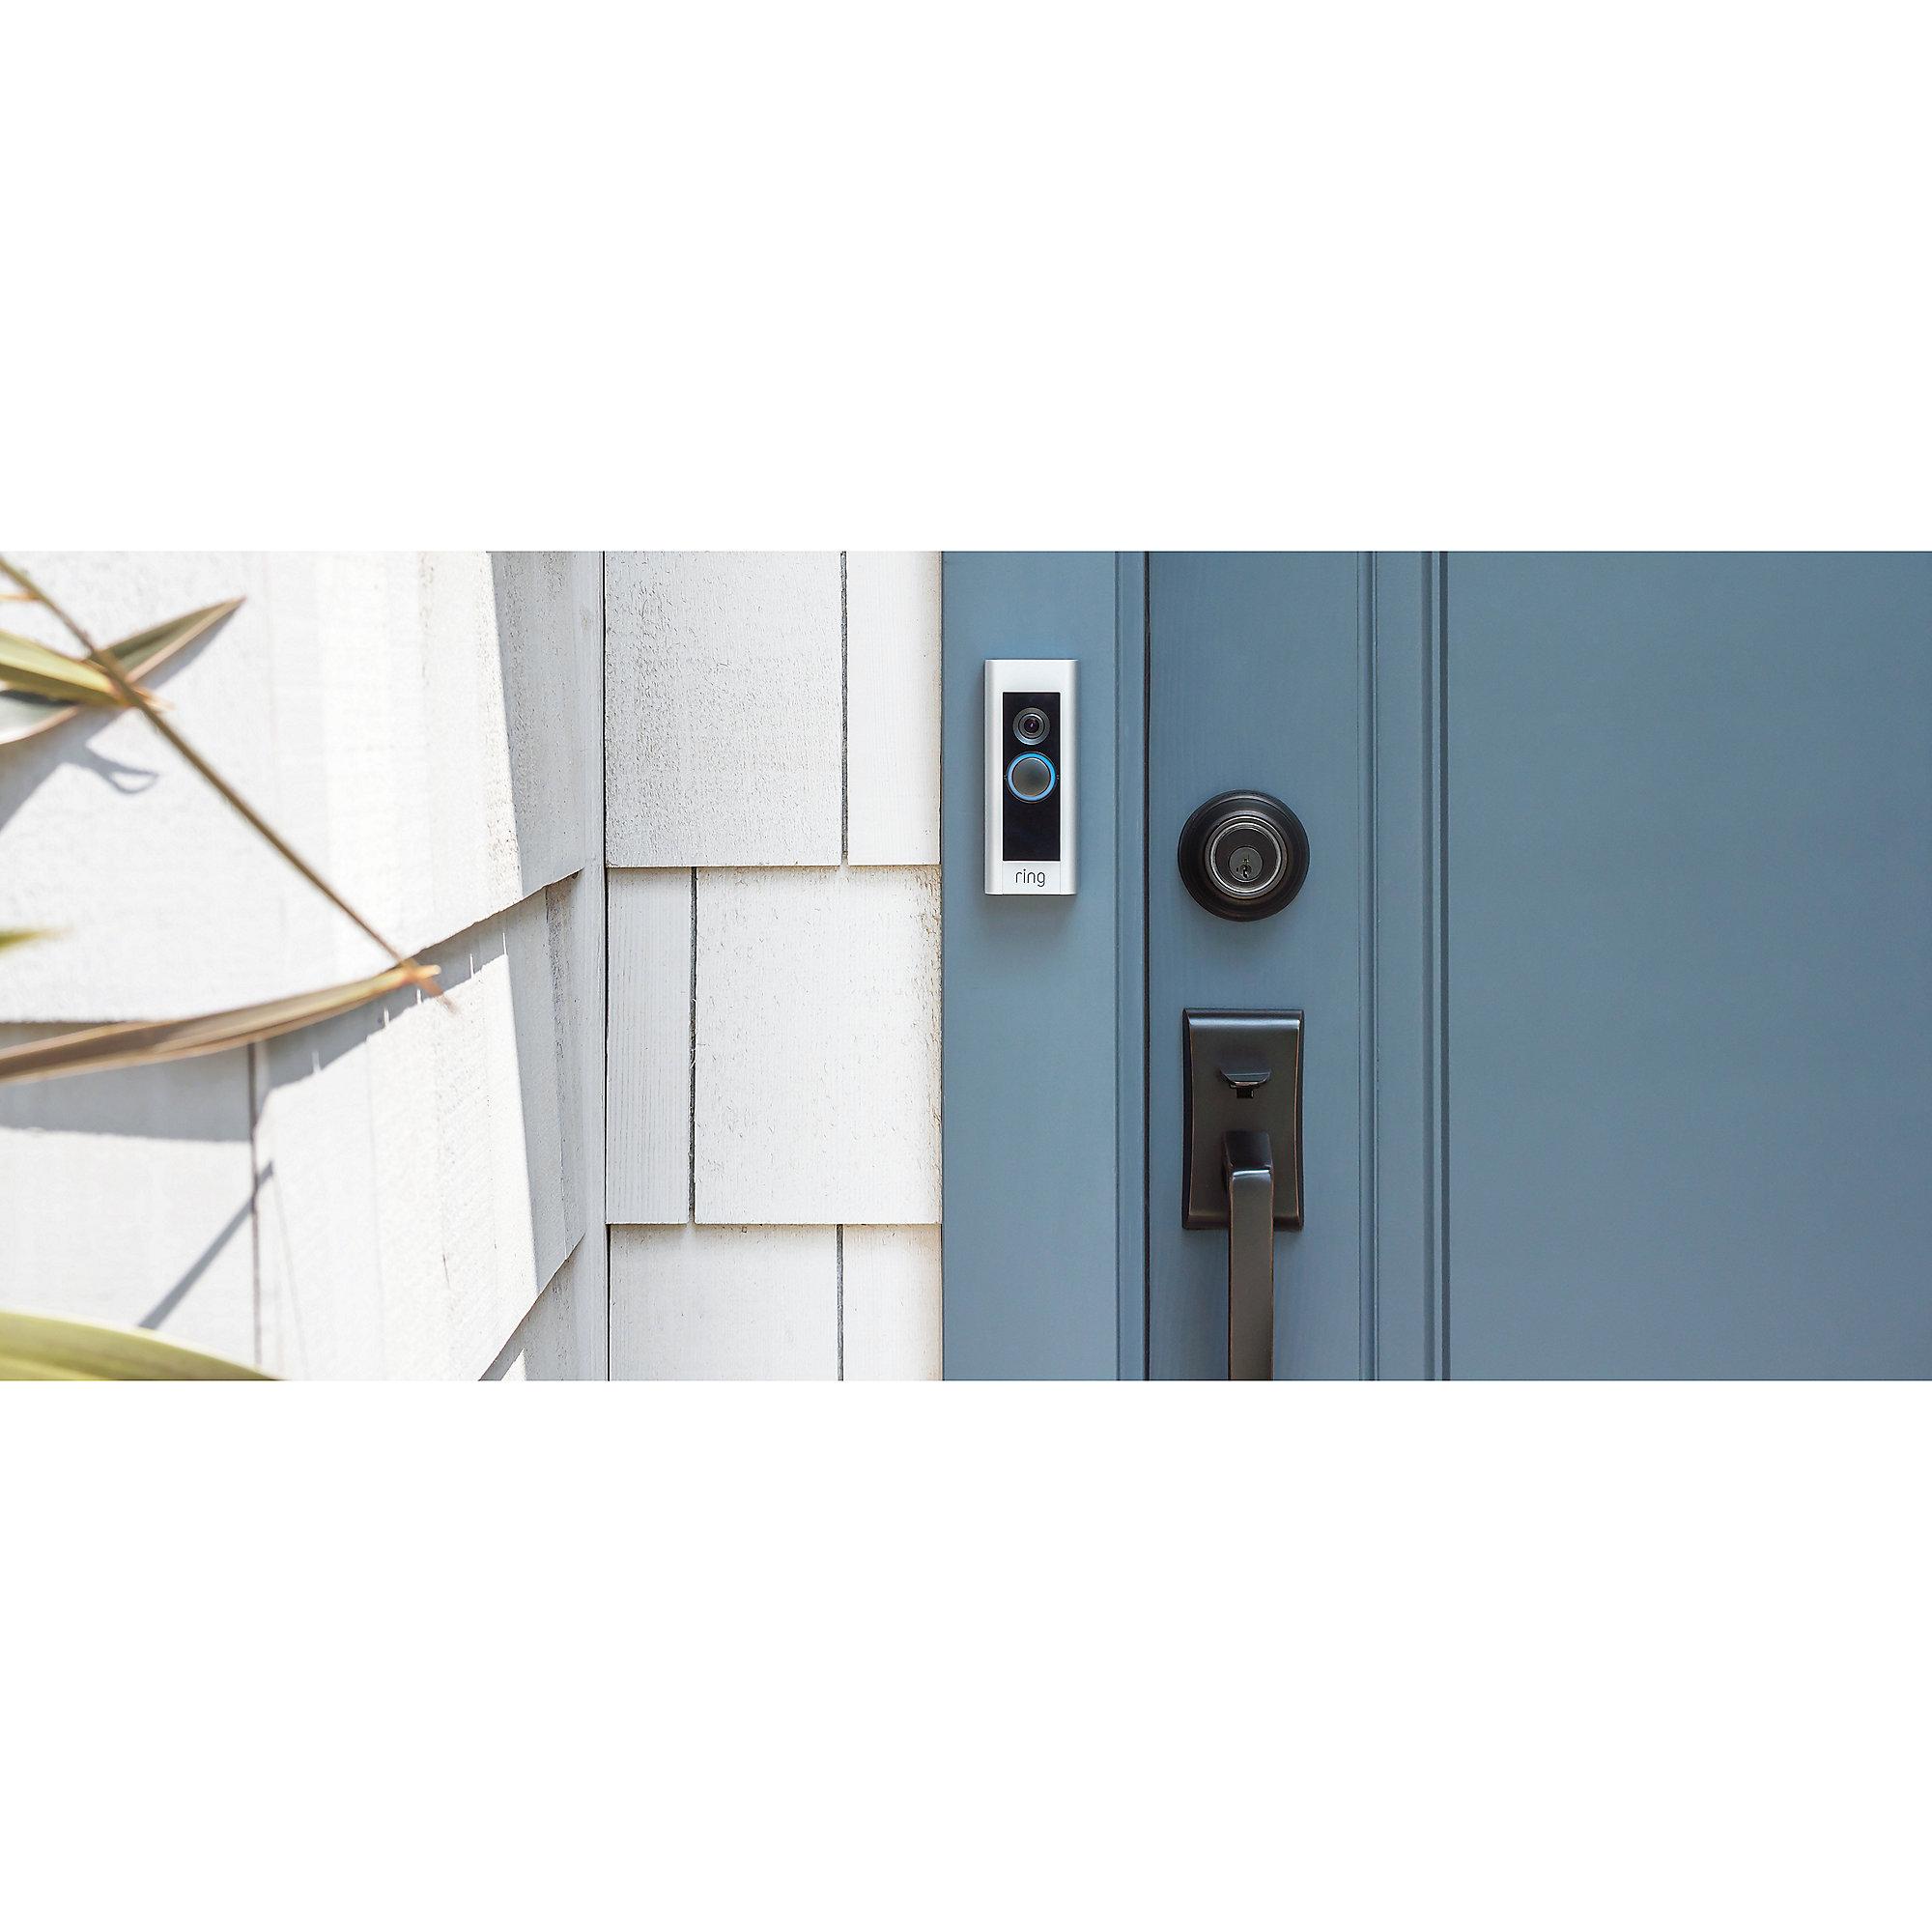 ring video t rklingel pro inkl chime gong transformer cyberport. Black Bedroom Furniture Sets. Home Design Ideas